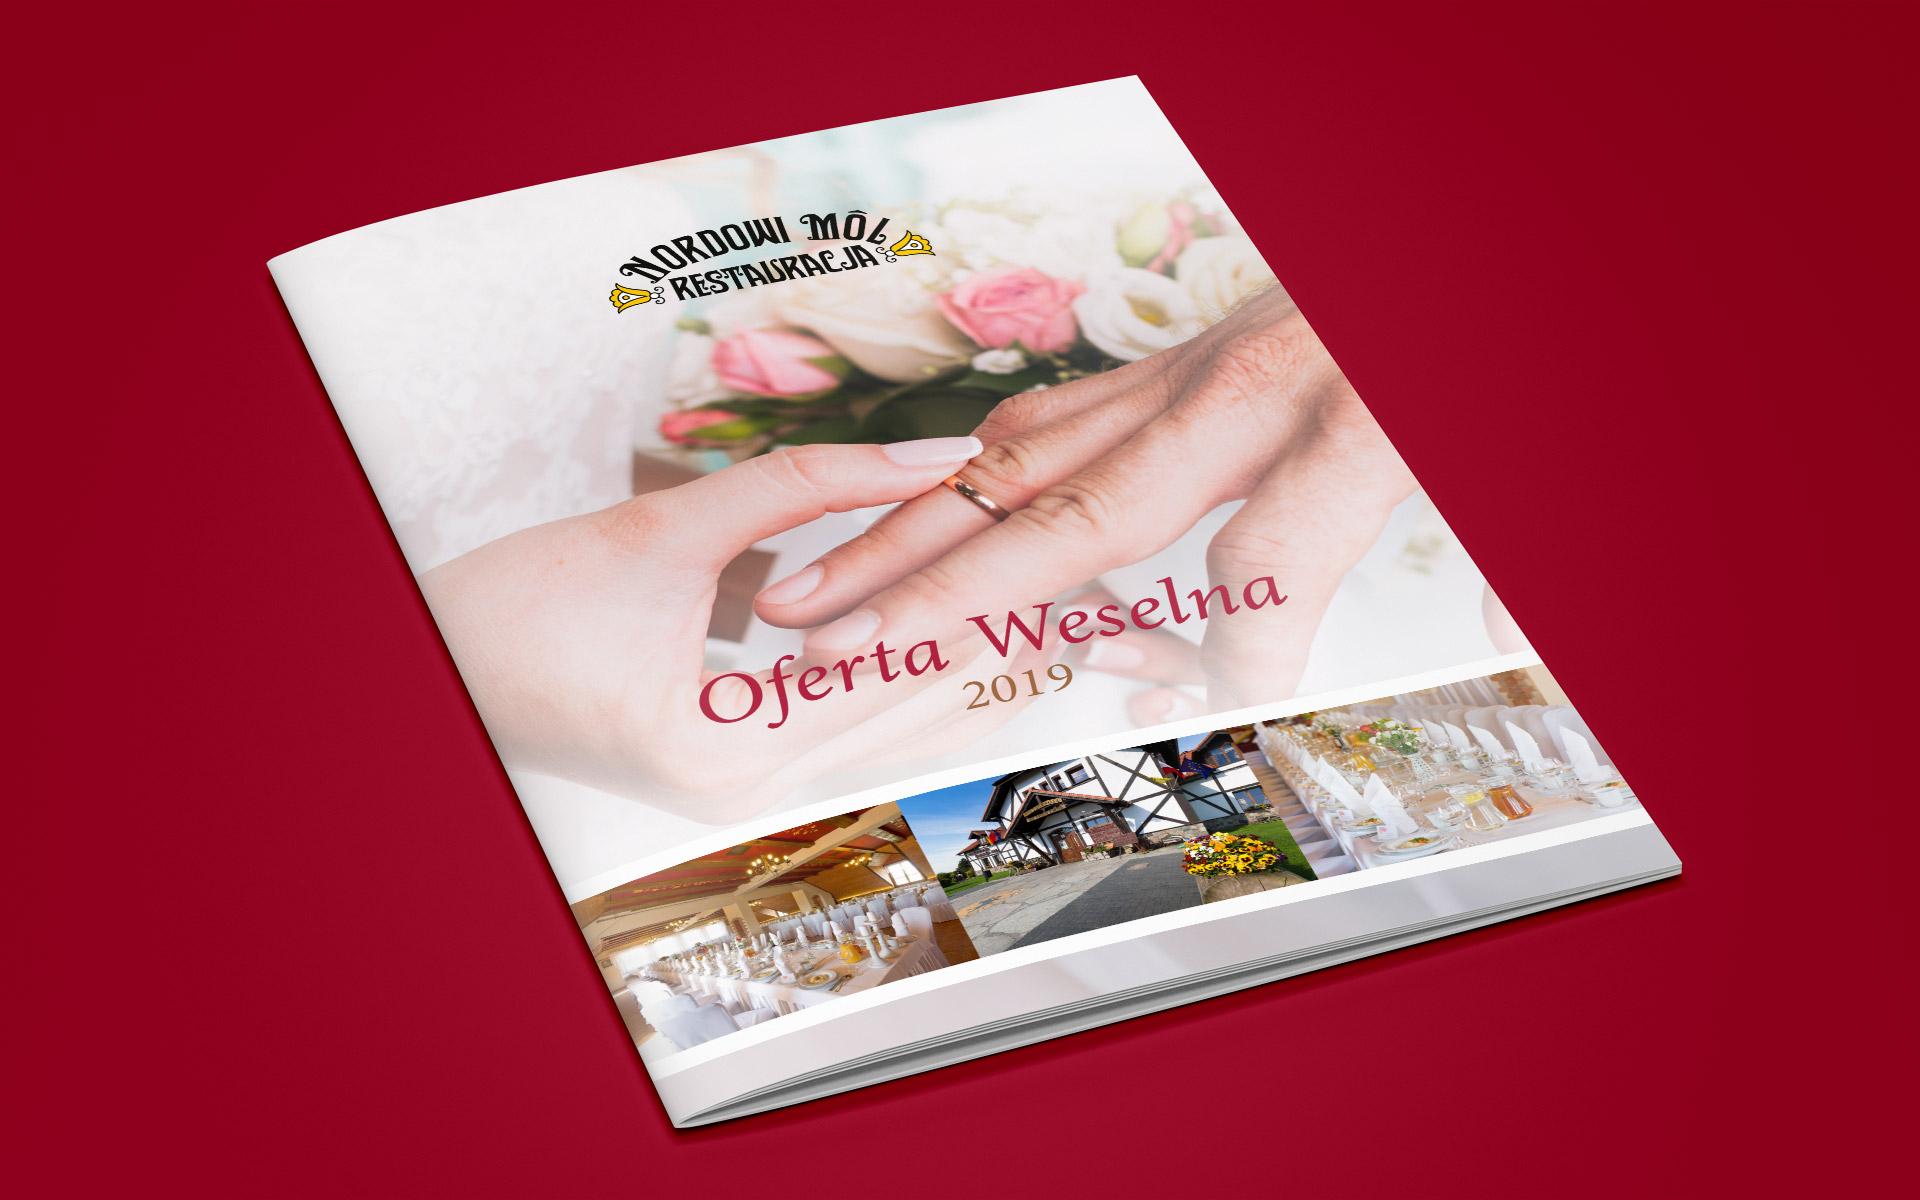 nordowimol-katalog